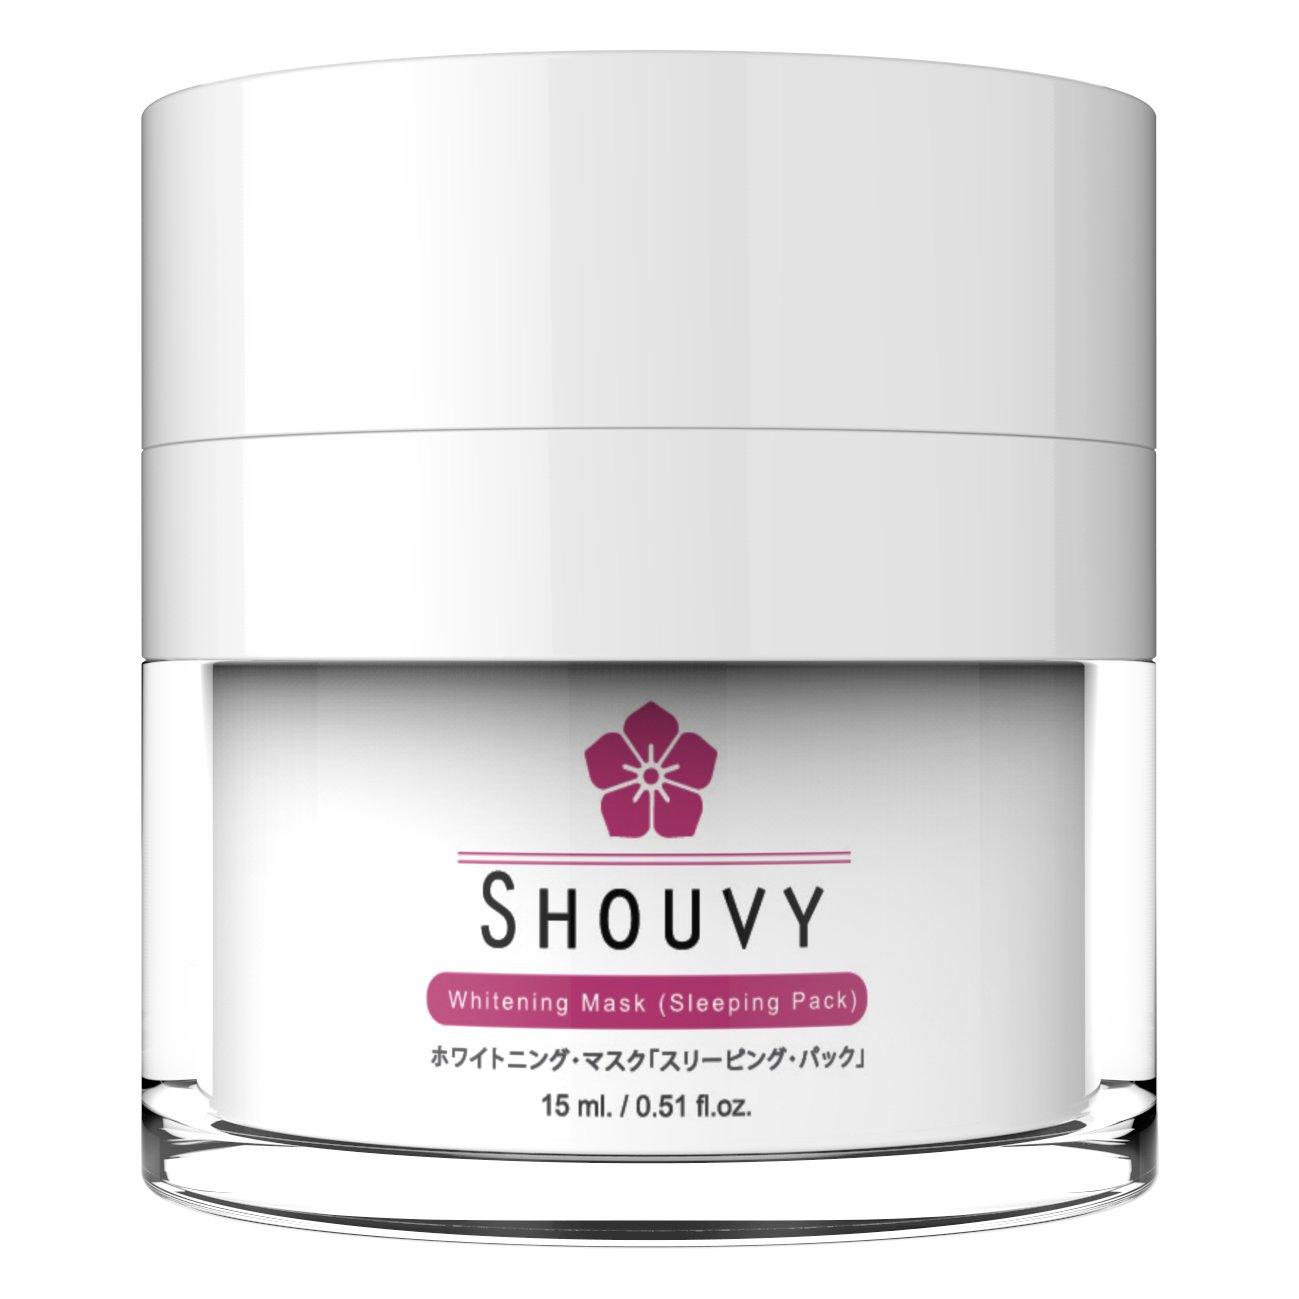 Whitening Mask Cream - Sleeping Pack - Skin Lightening & Anti Aging For Facial - Removing Dark Spots Corrector & Age Spots with Glutathione, Alpha Arbutin, Vitamin C + B3 + B5, Beta Glucan, Brassica